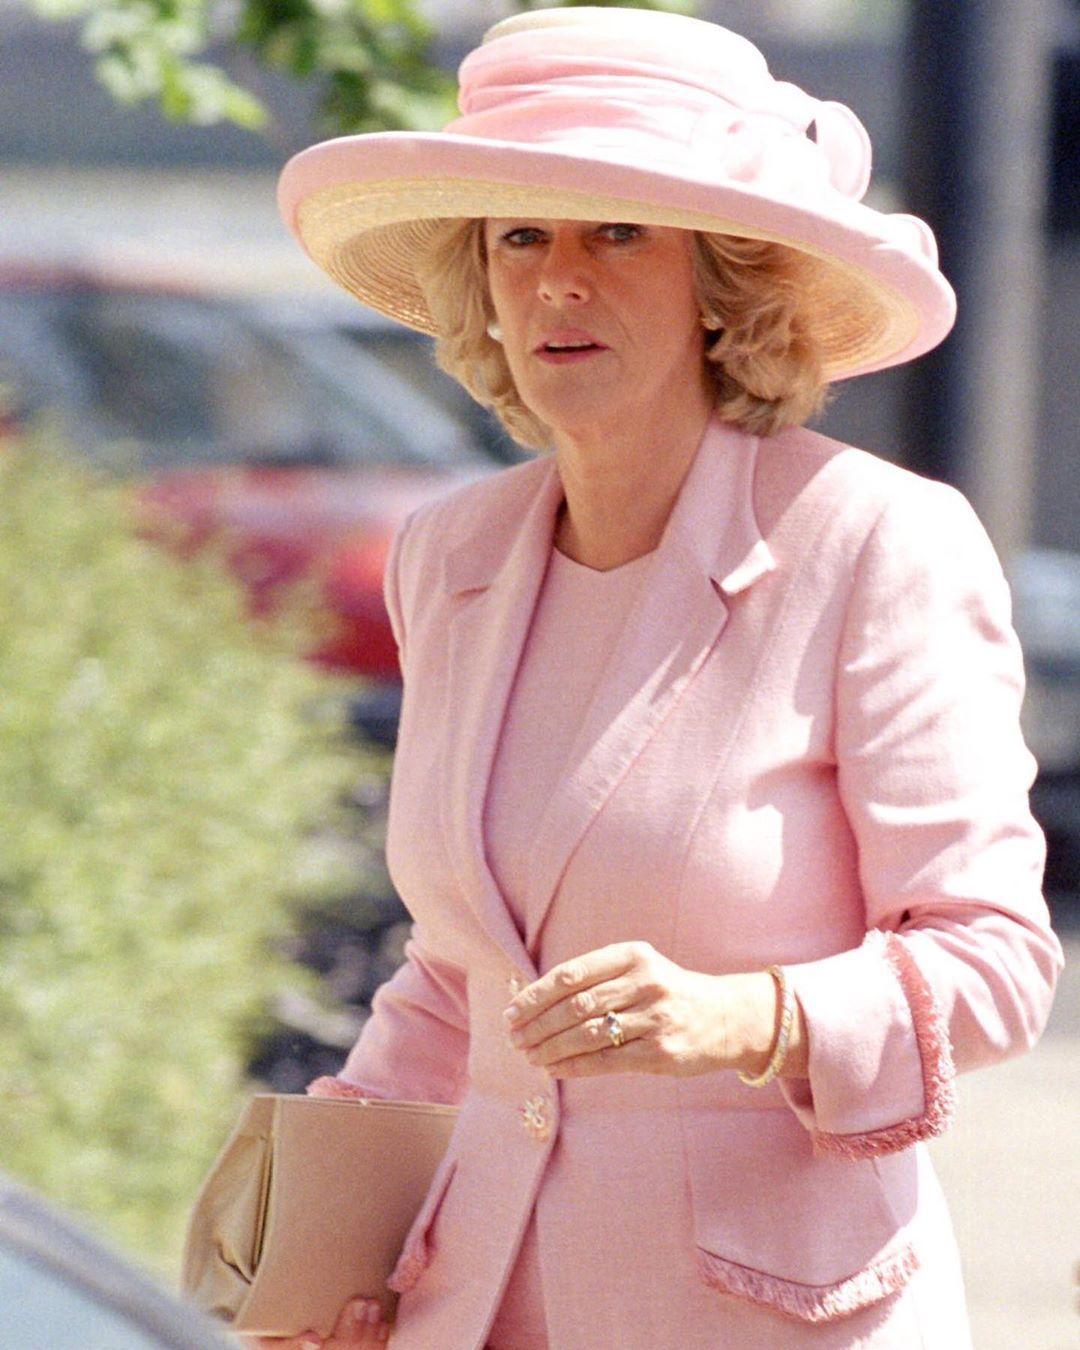 Camilla duchess of cornwall in 2020 camilla parker